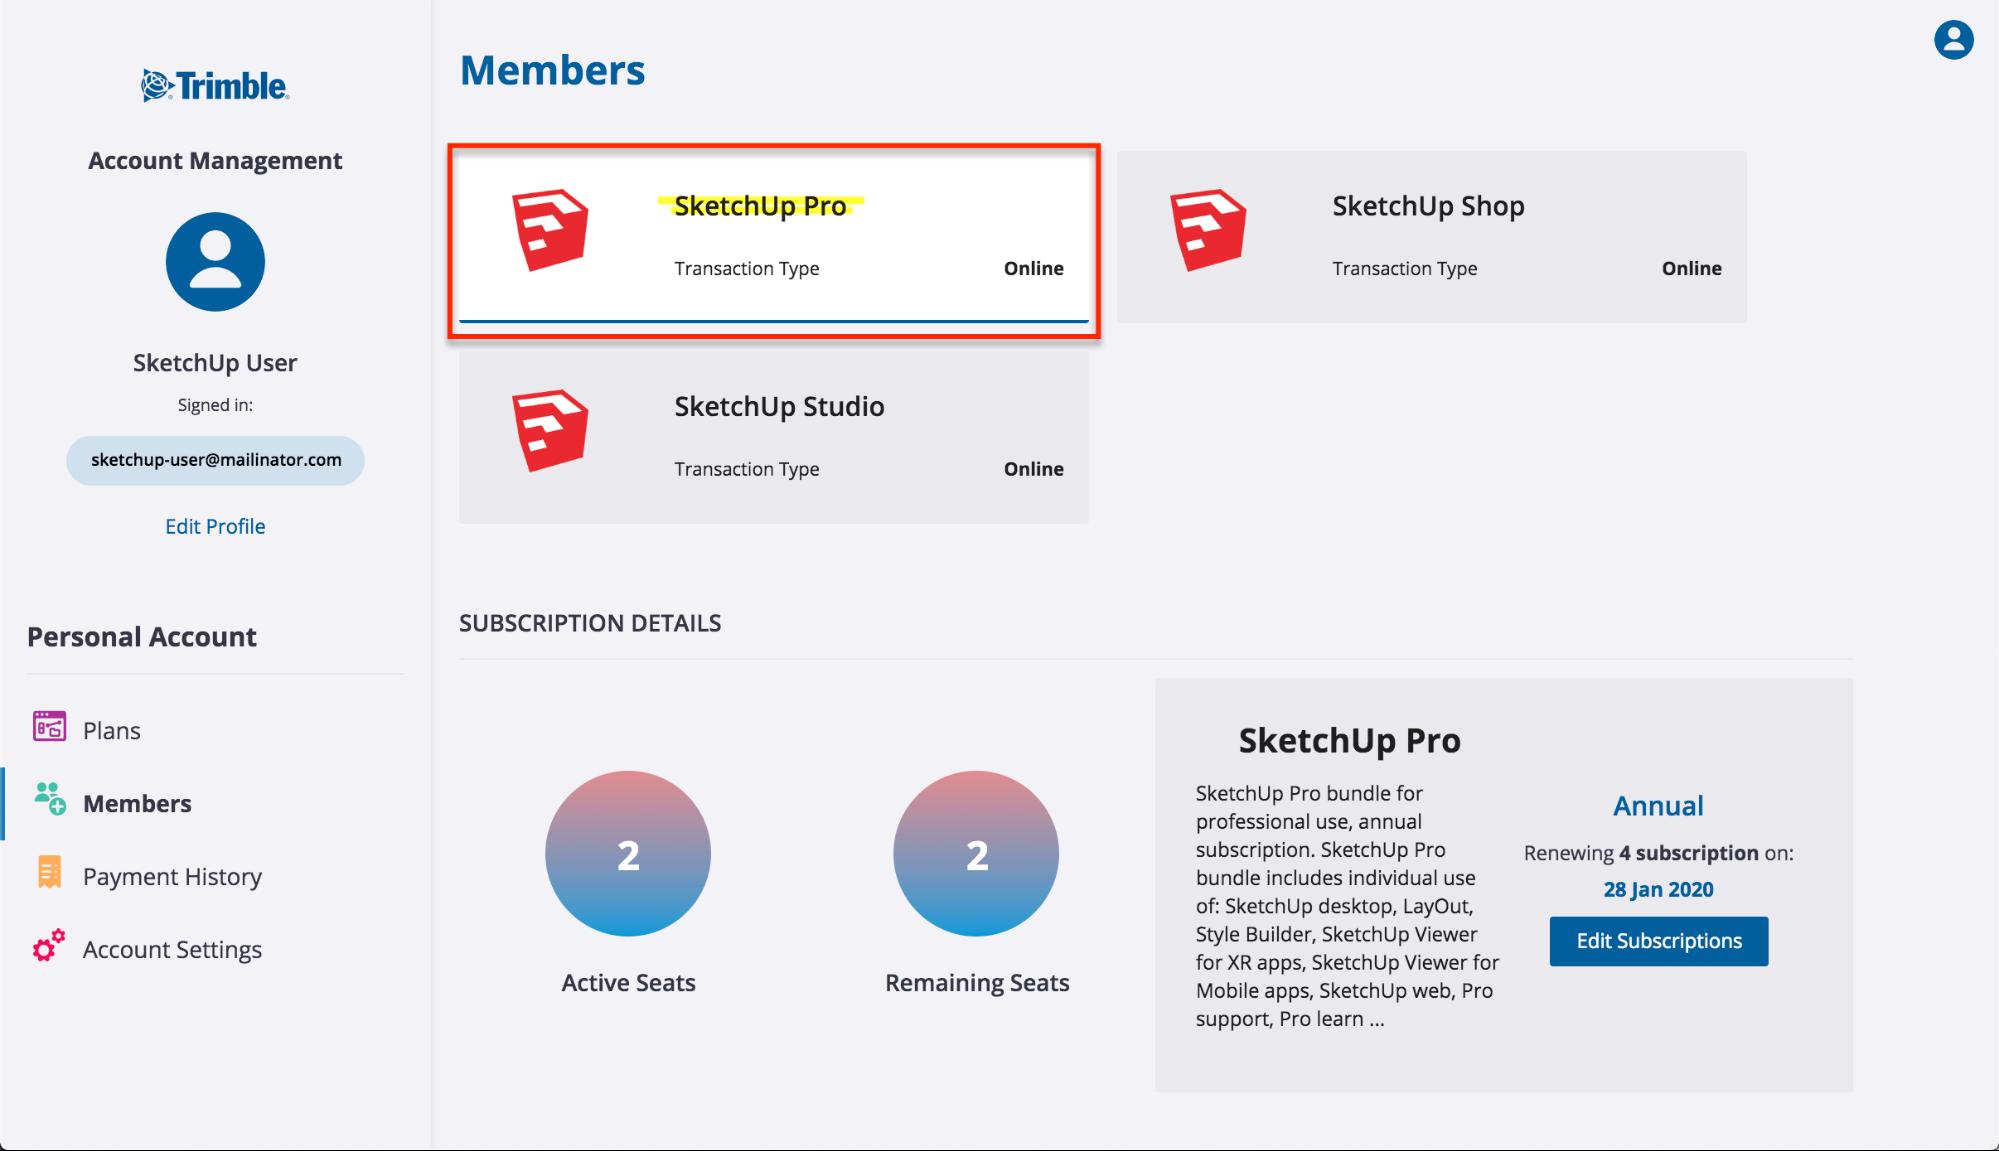 Managing Subscription Plans | SketchUp Help